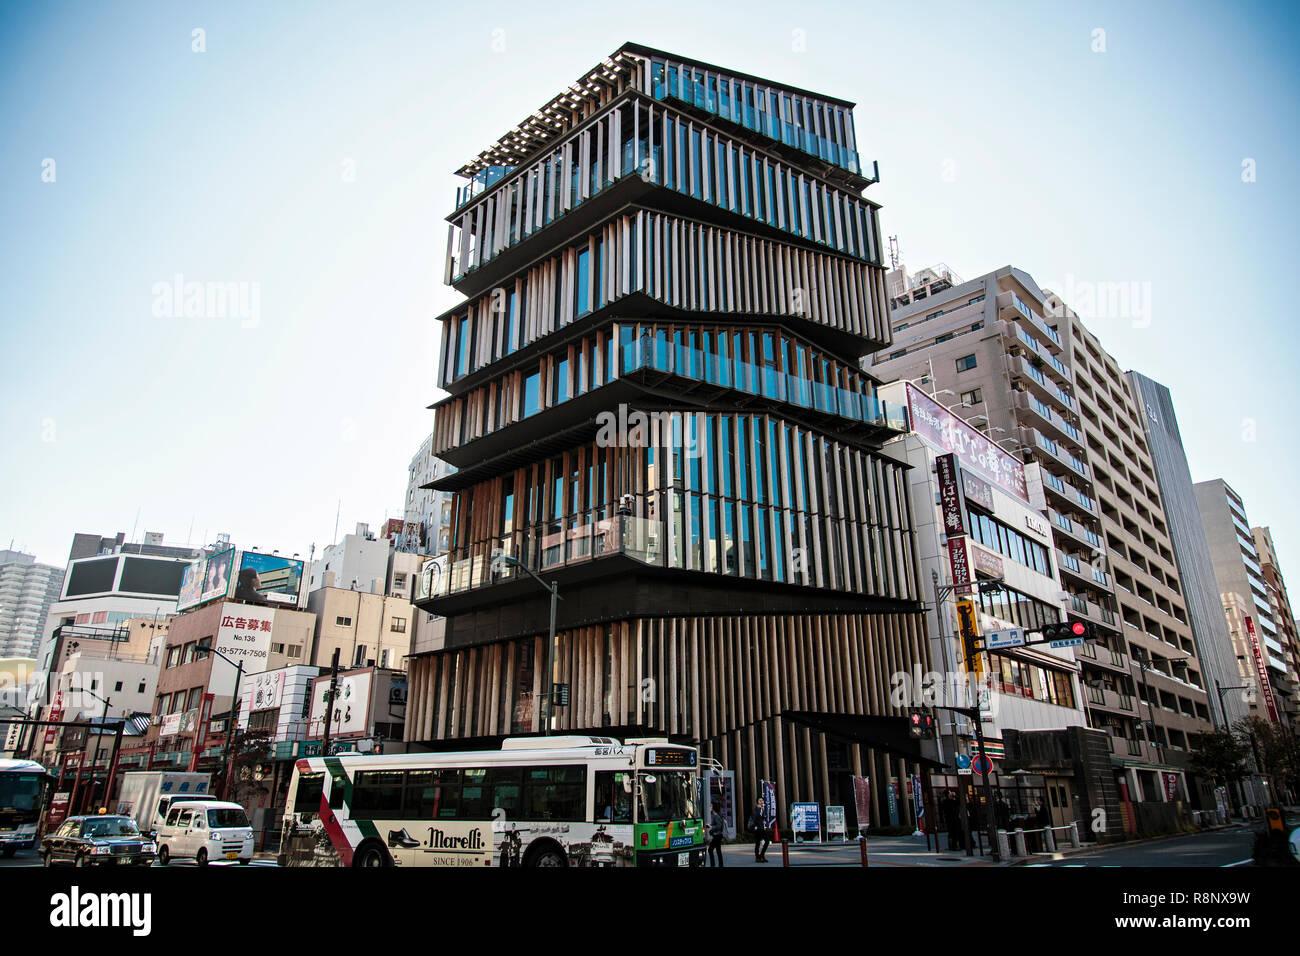 The Asakusa Culture Tourist Information Centre in Tokyo - Stock Image